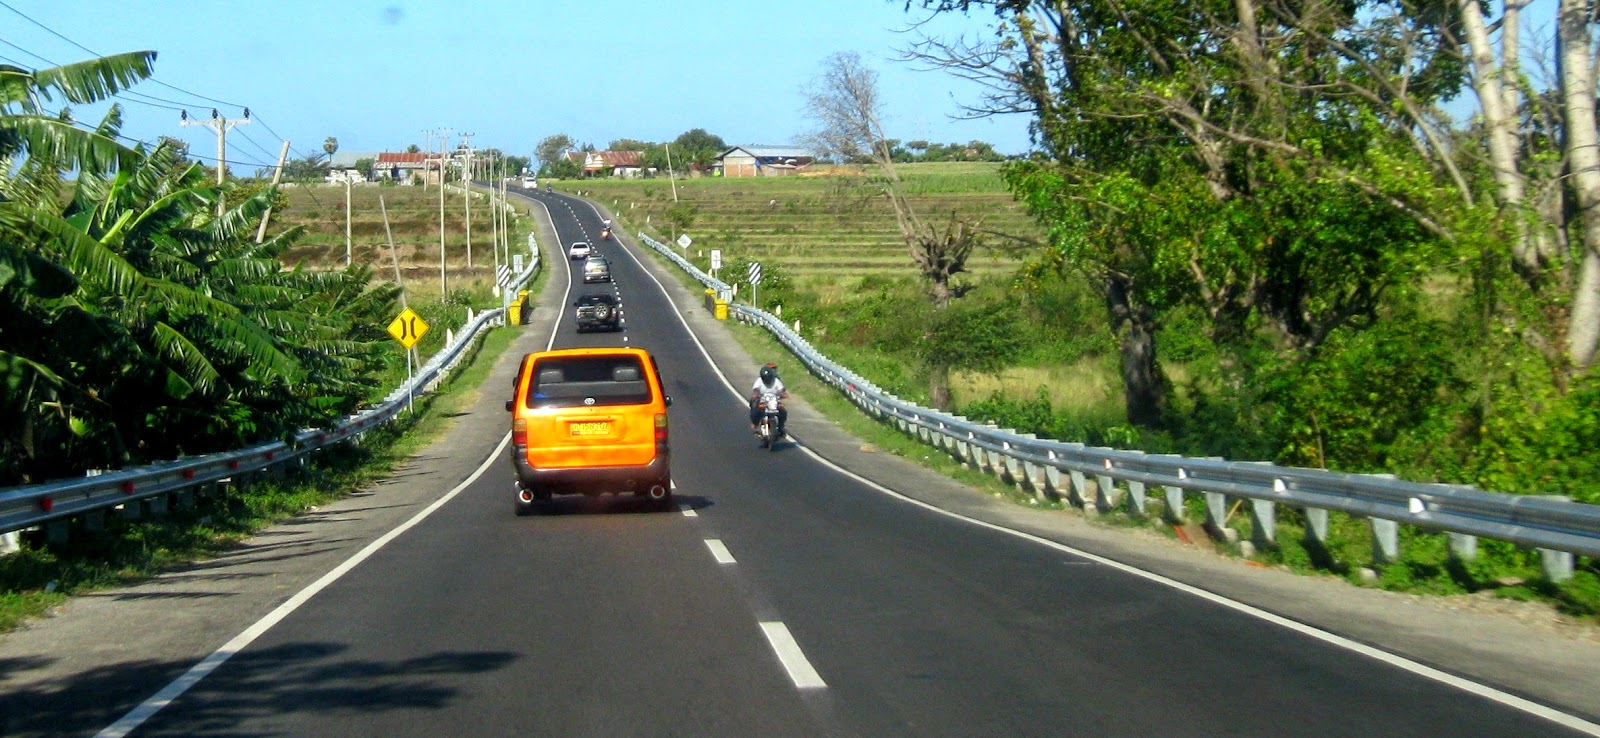 Jalan Utama Selatan Sulsel Semulus Tol